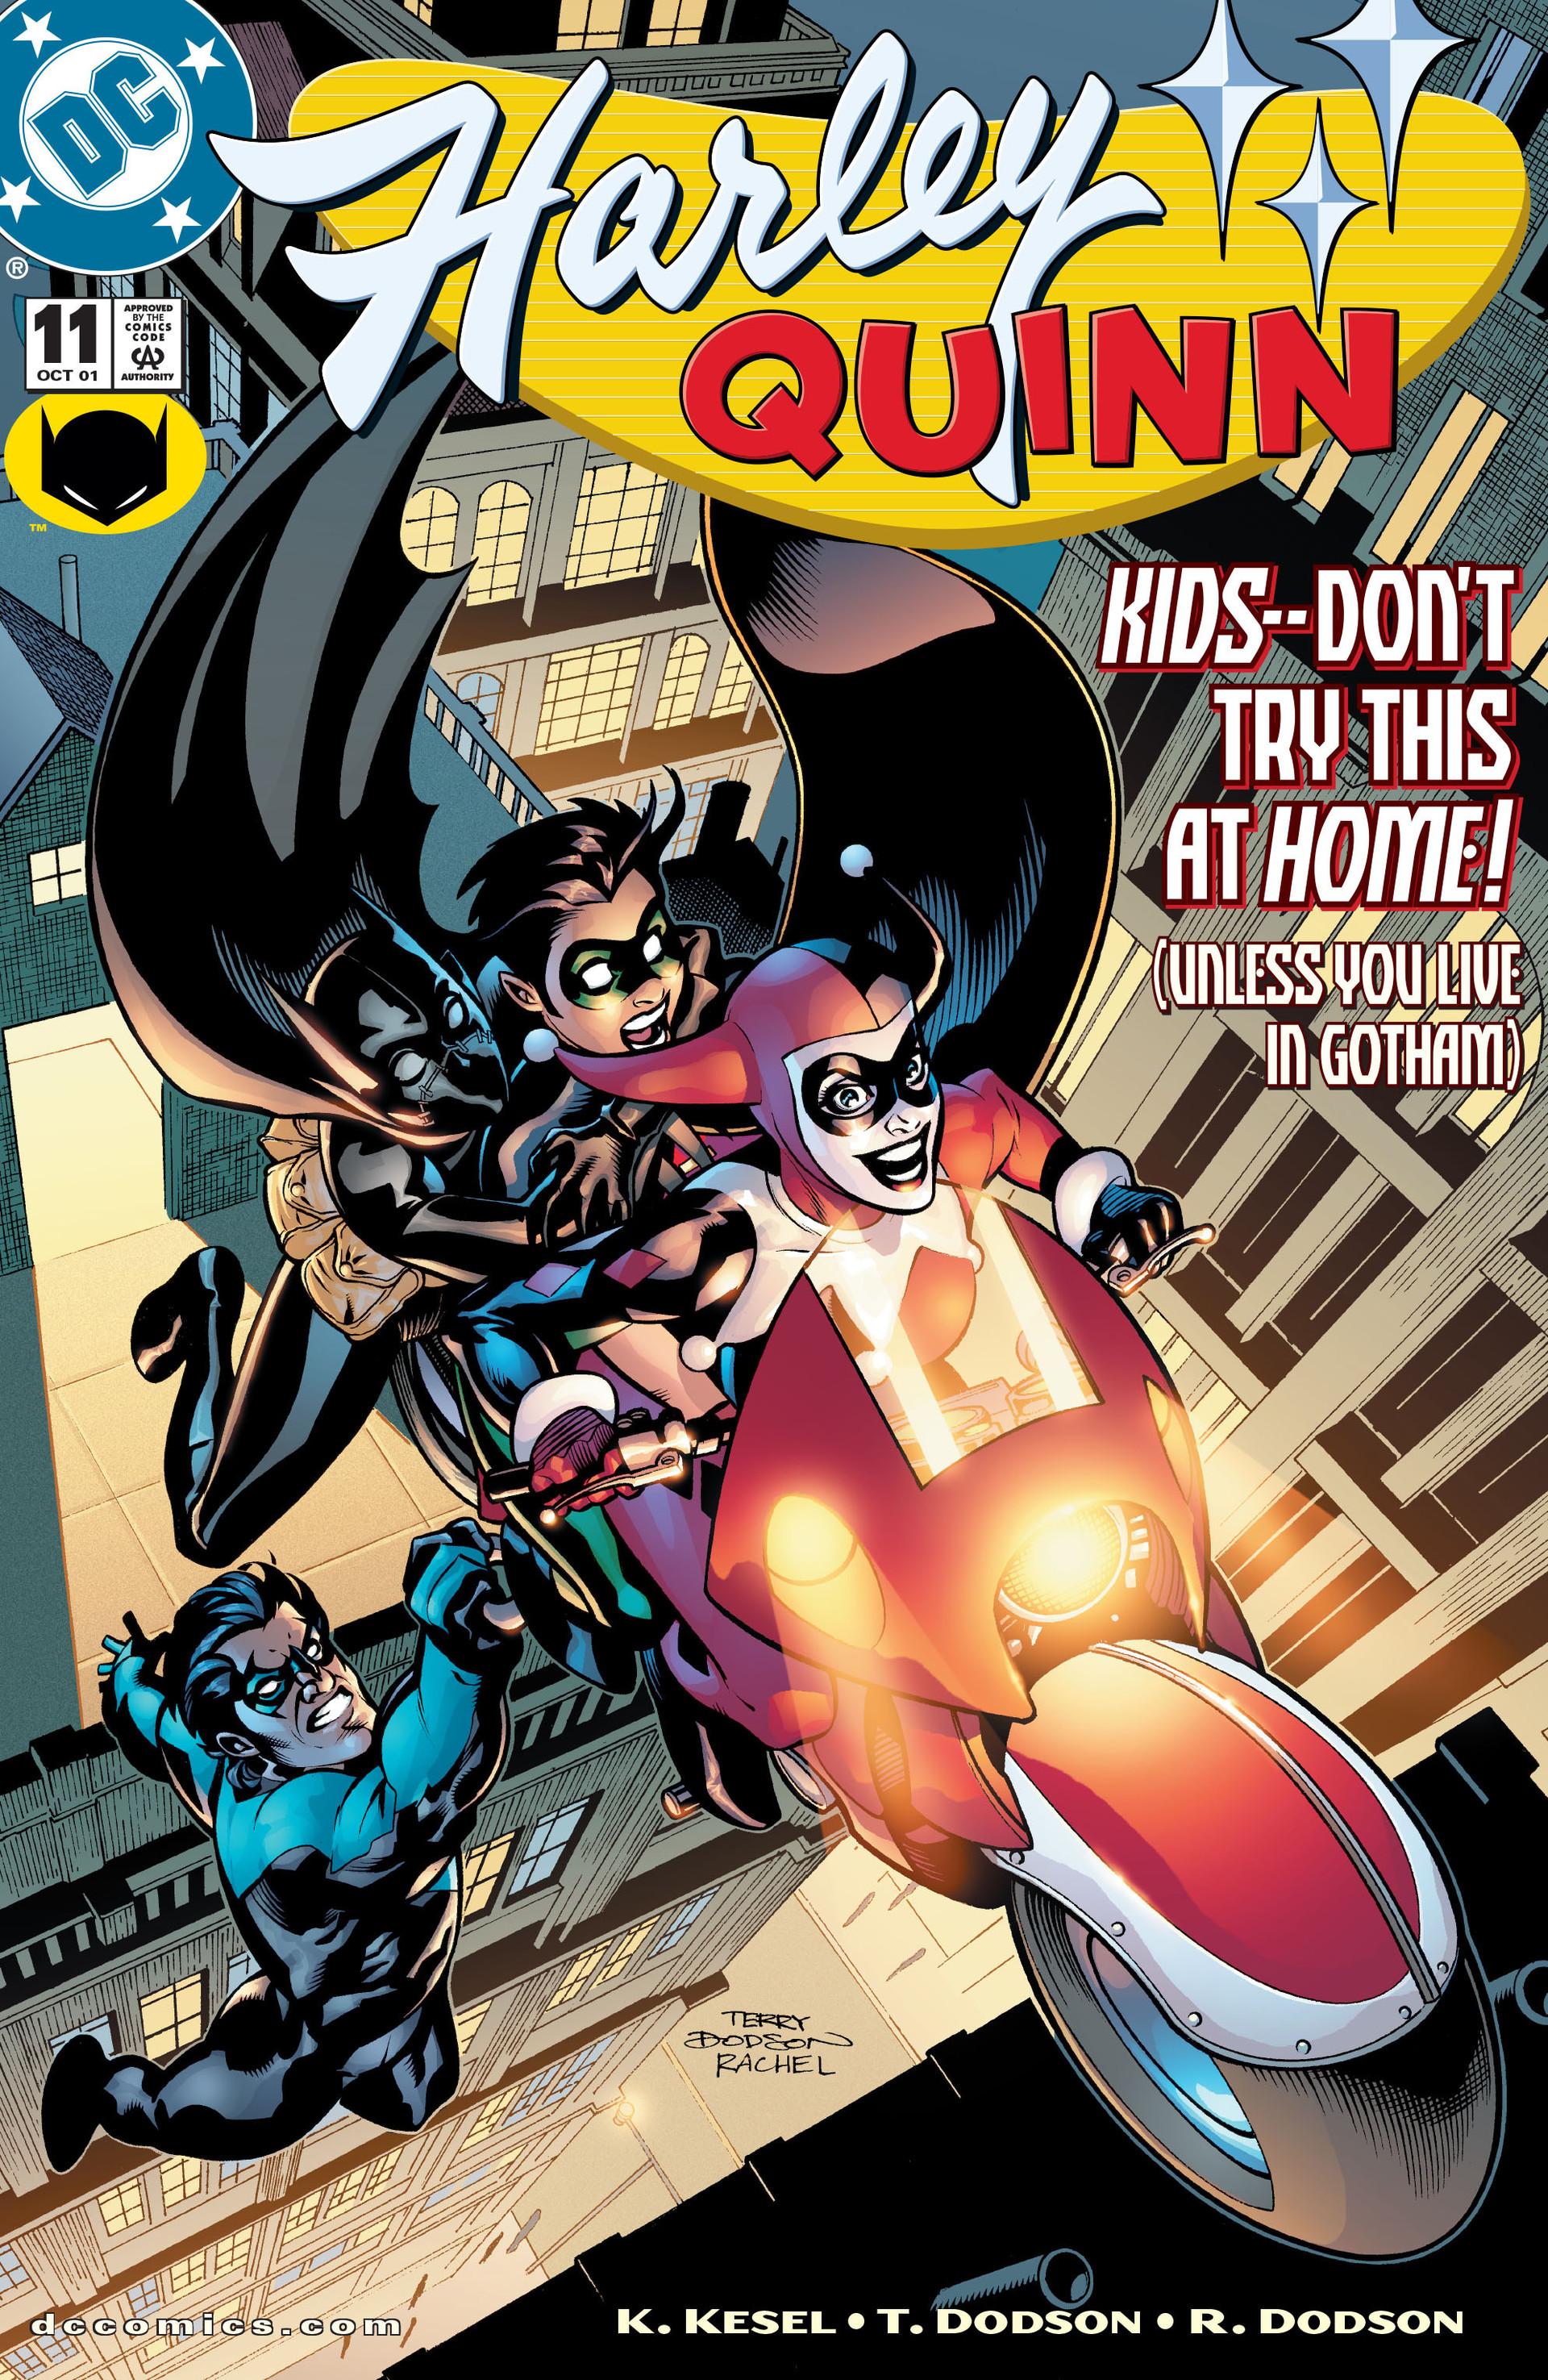 Harley Quinn Vol.1 #11